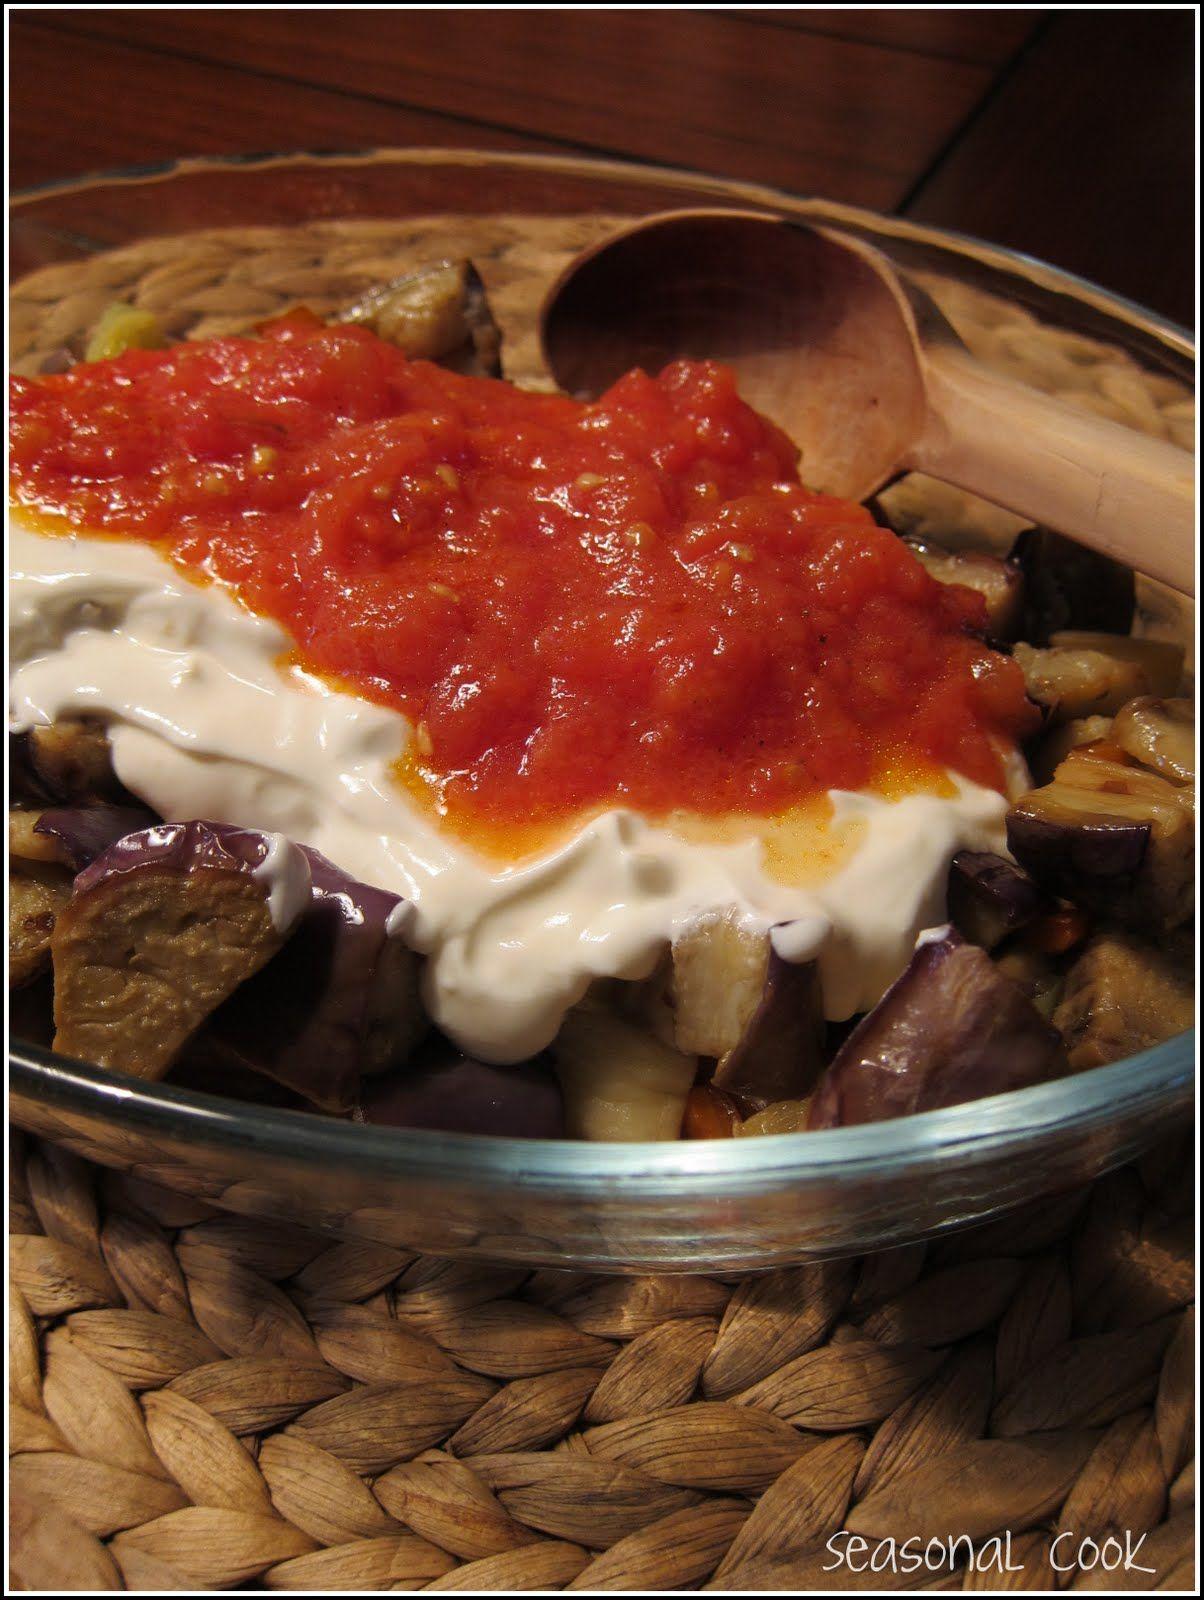 A Seasonal Cook in Turkey Shakshuka an Aubergine Meze